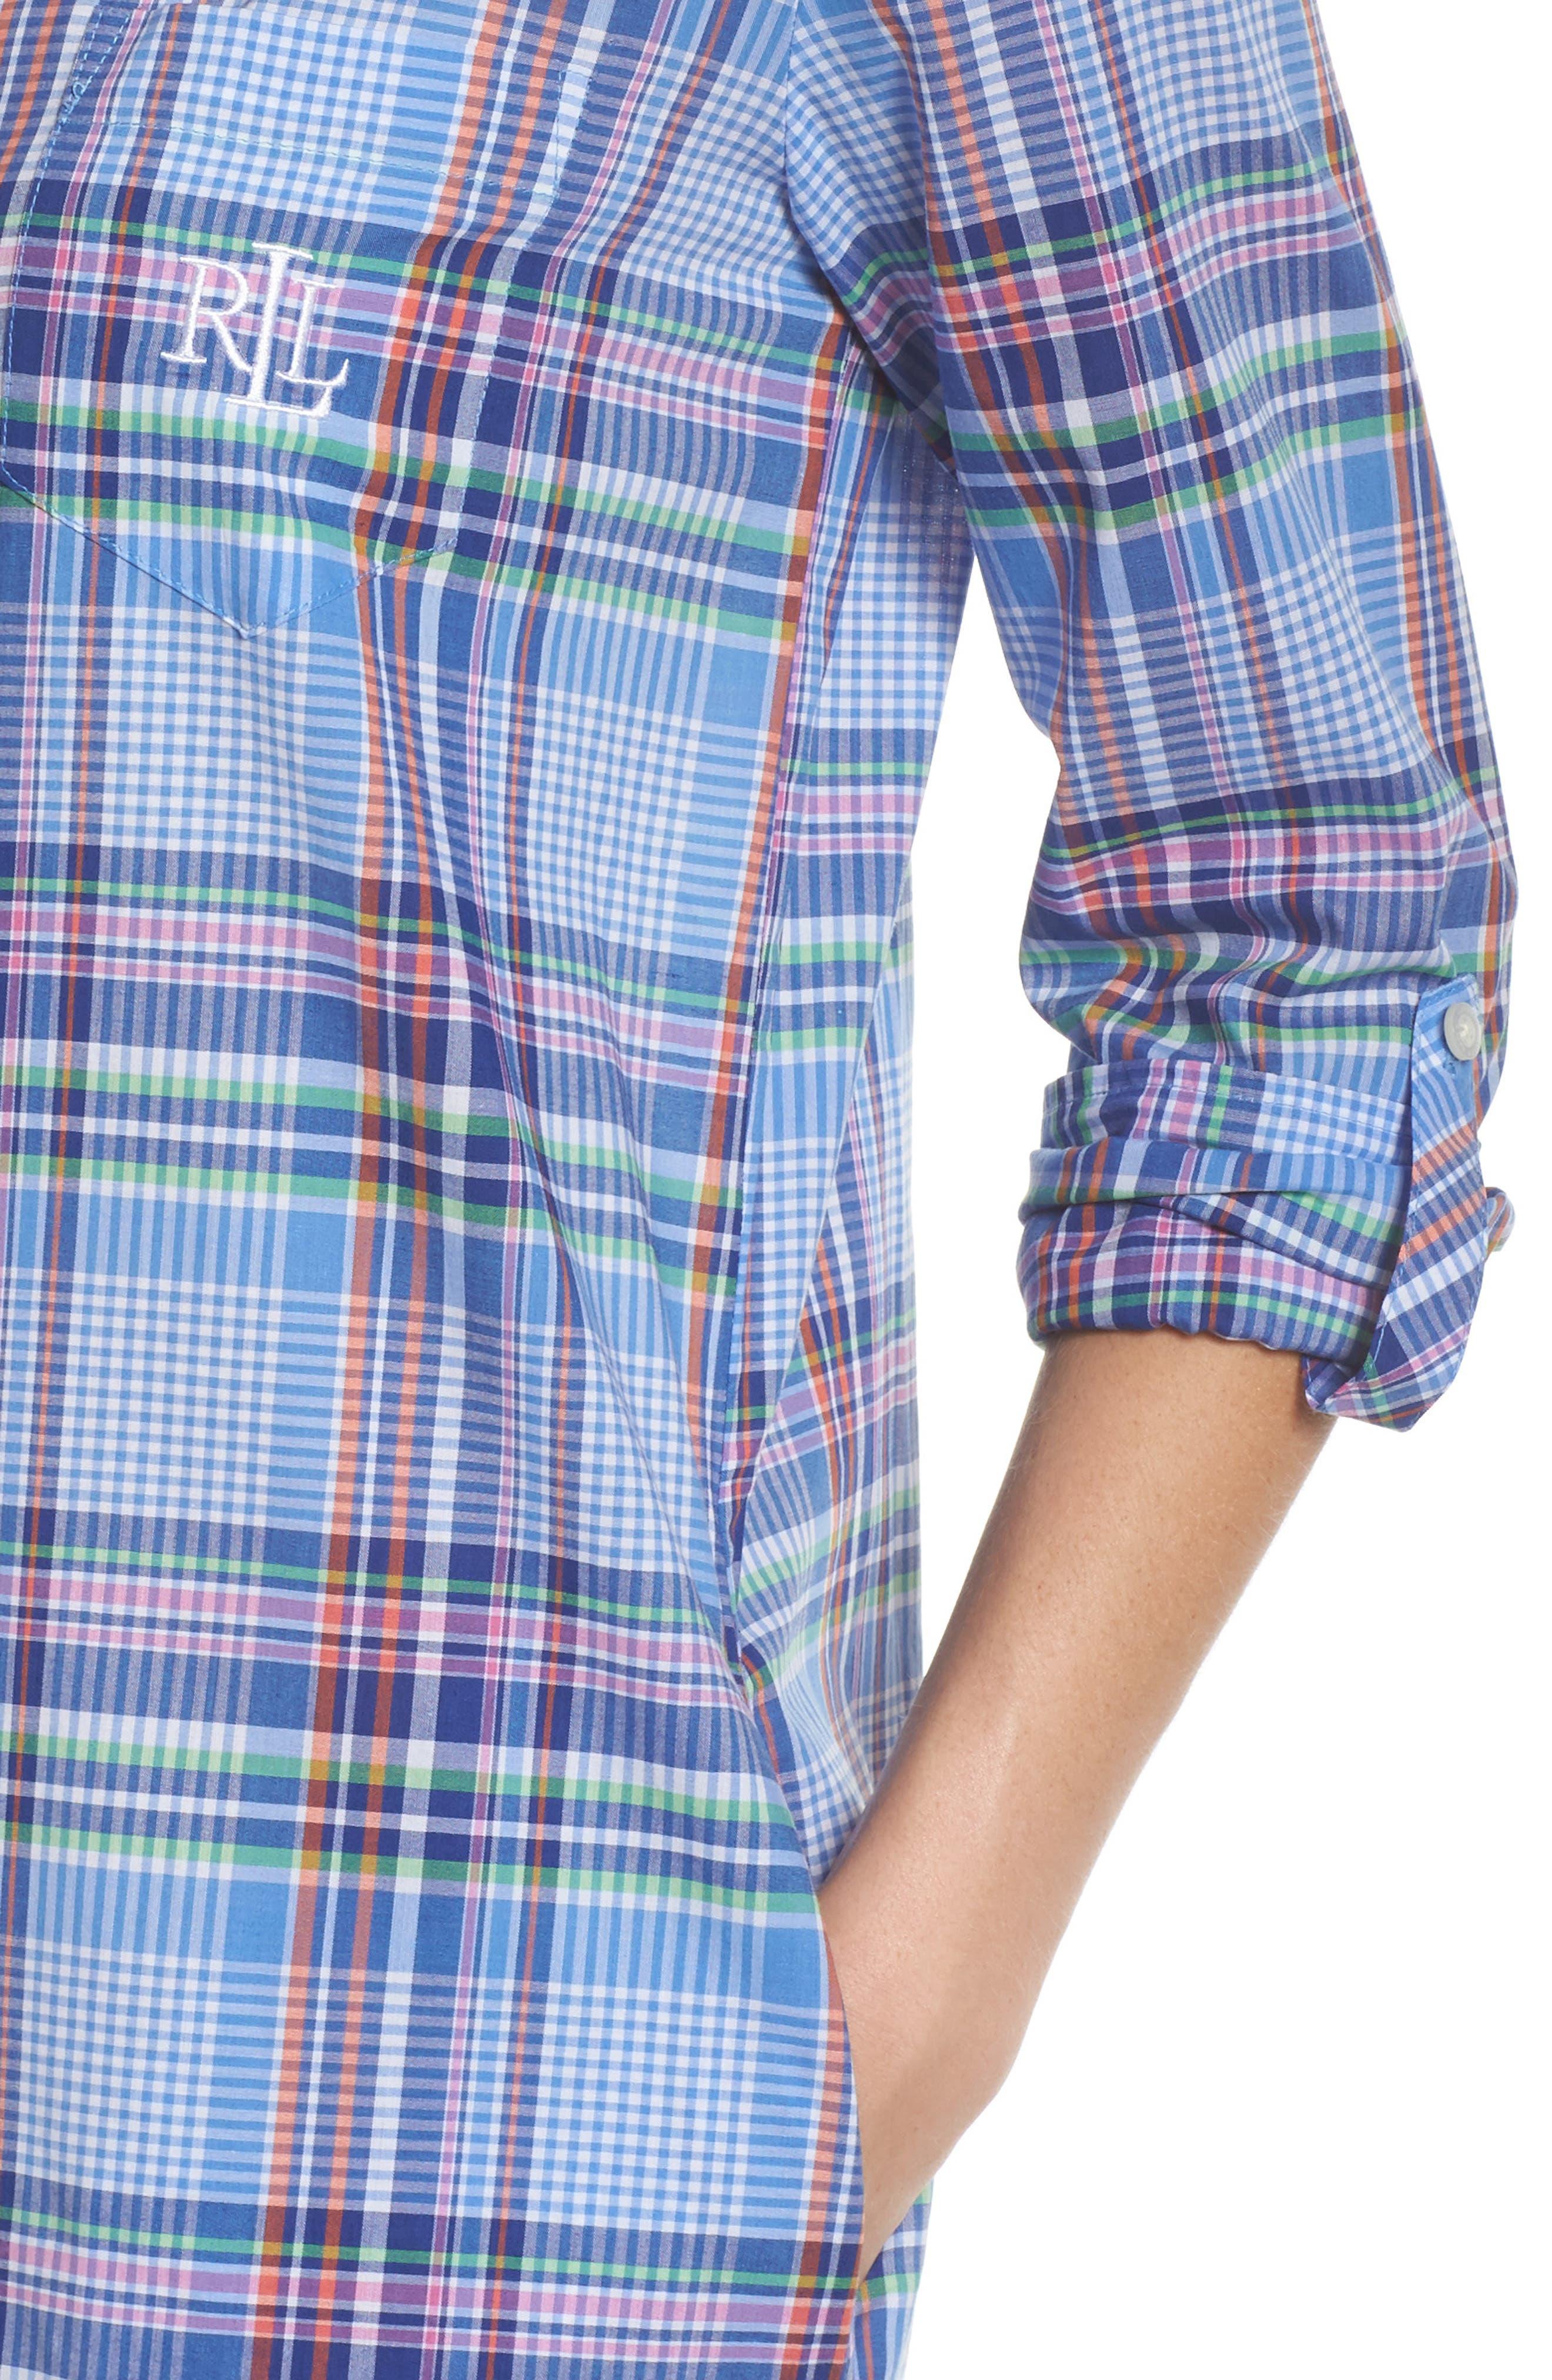 Ballet Plaid Sleep Shirt,                             Alternate thumbnail 5, color,                             Blue Plaid